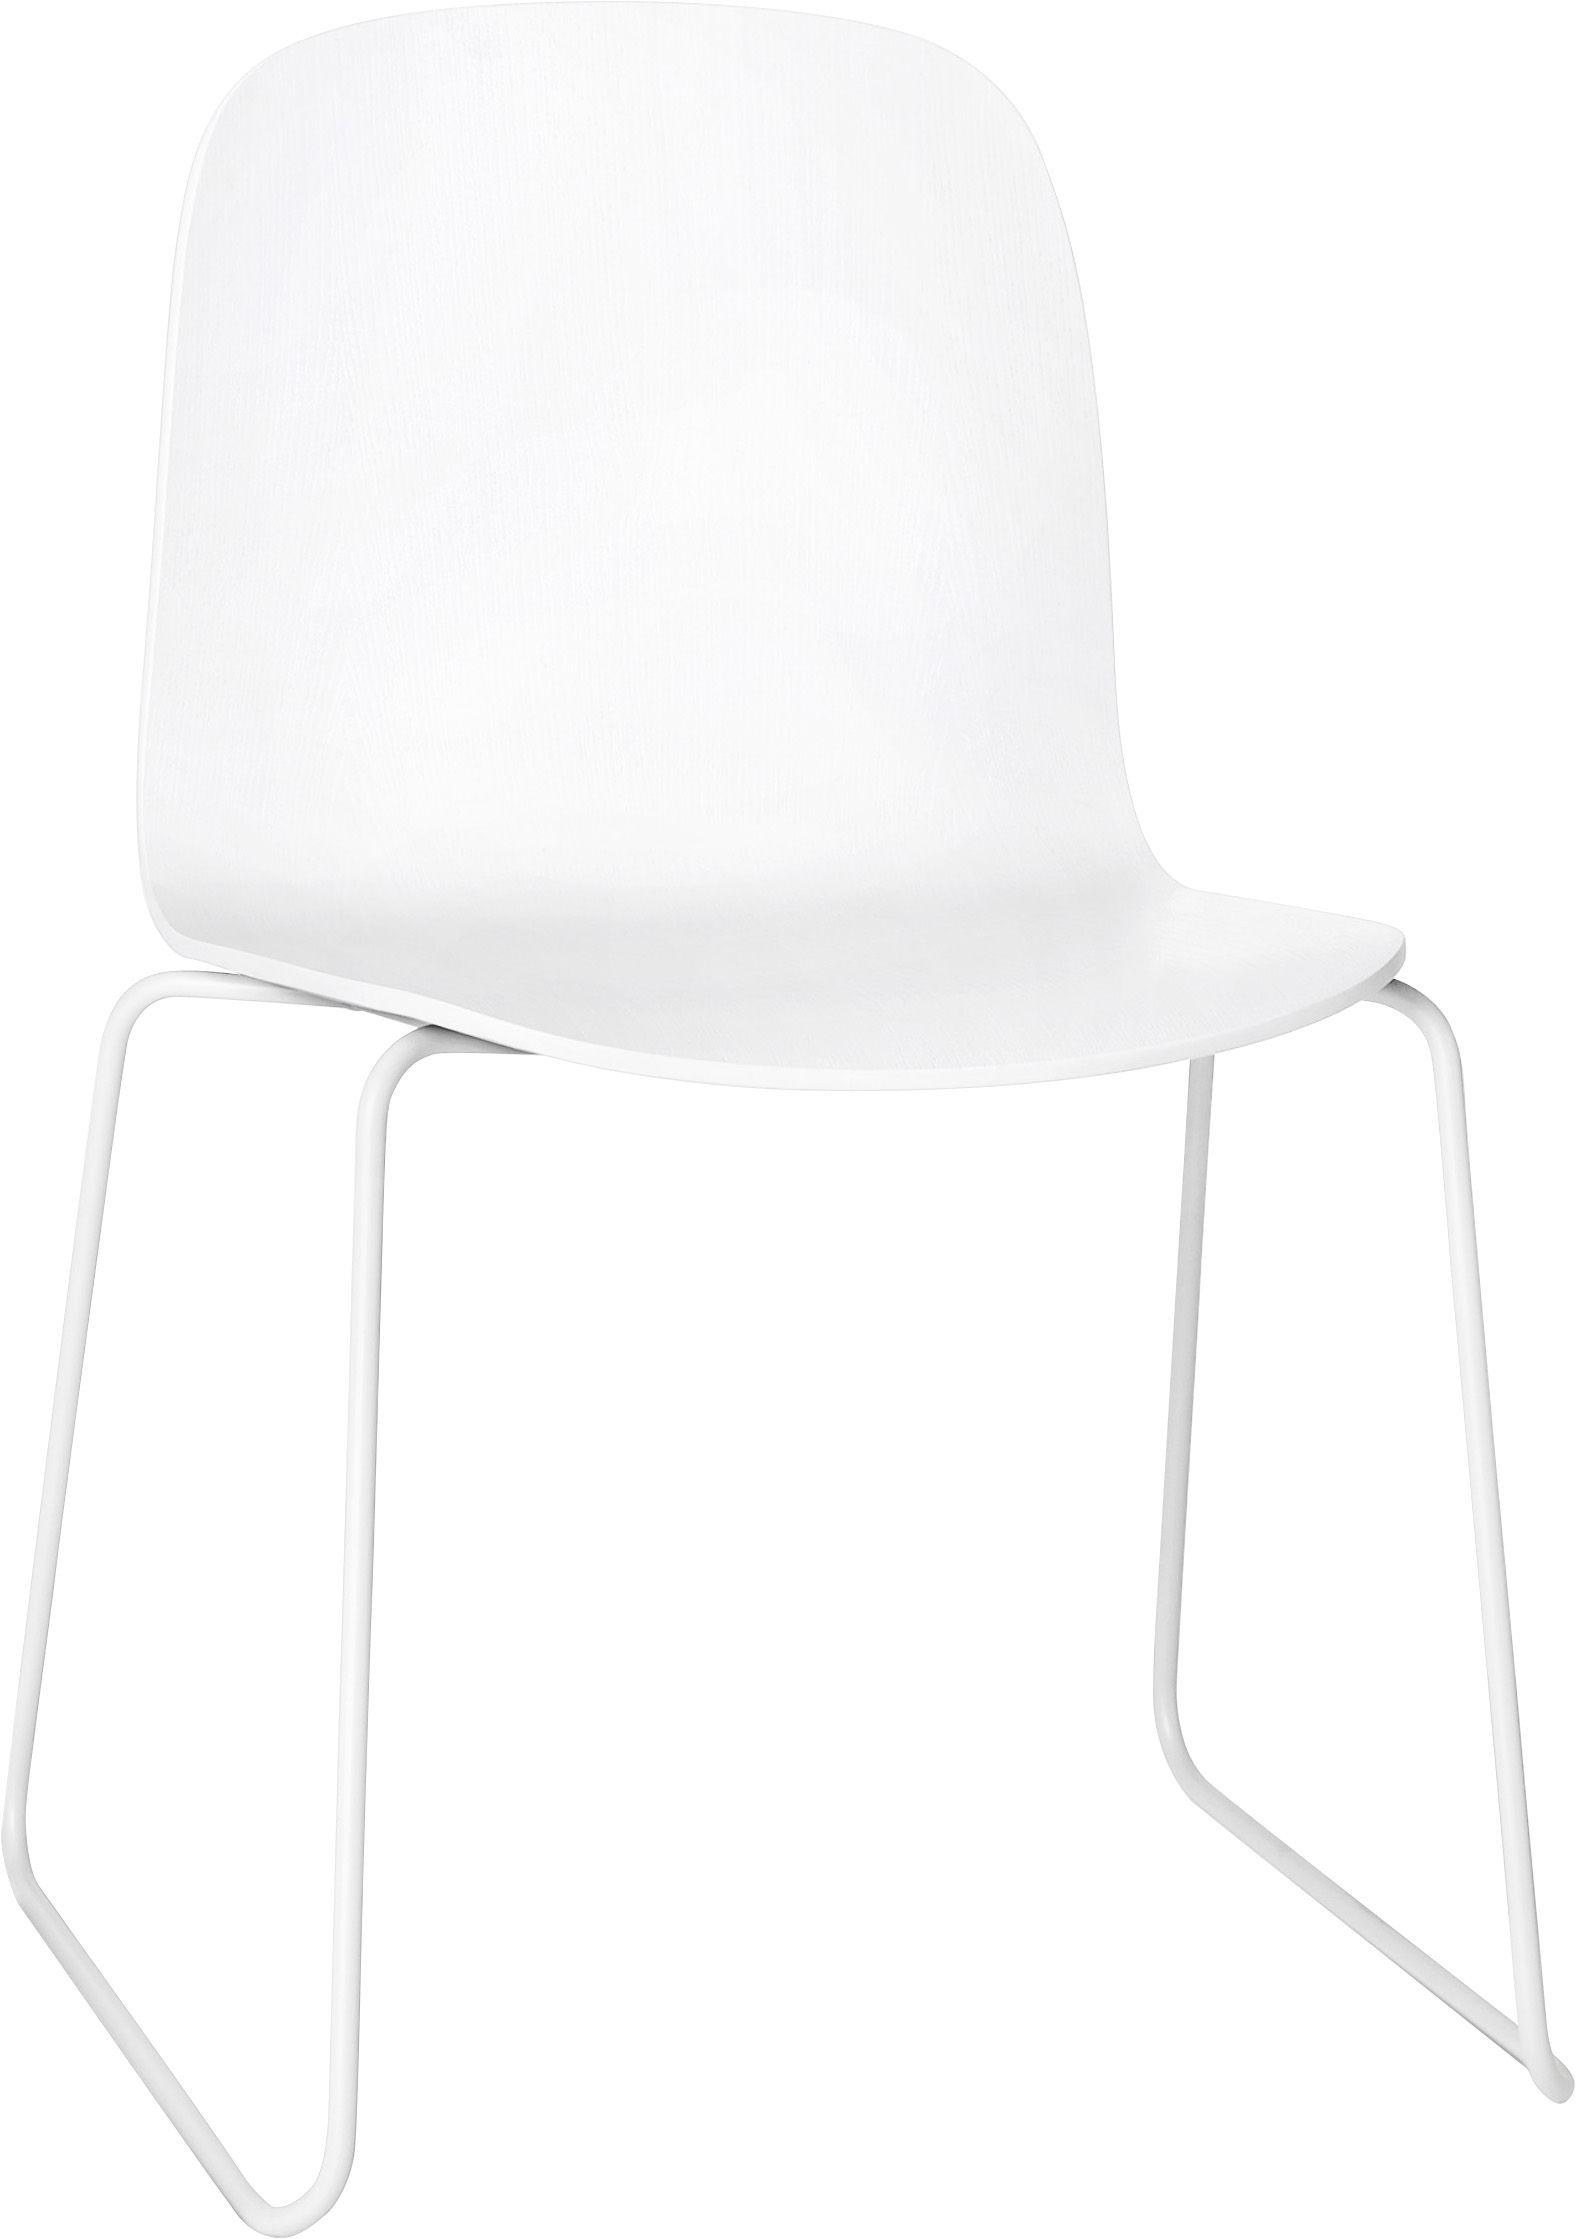 Visu Stackable Chair